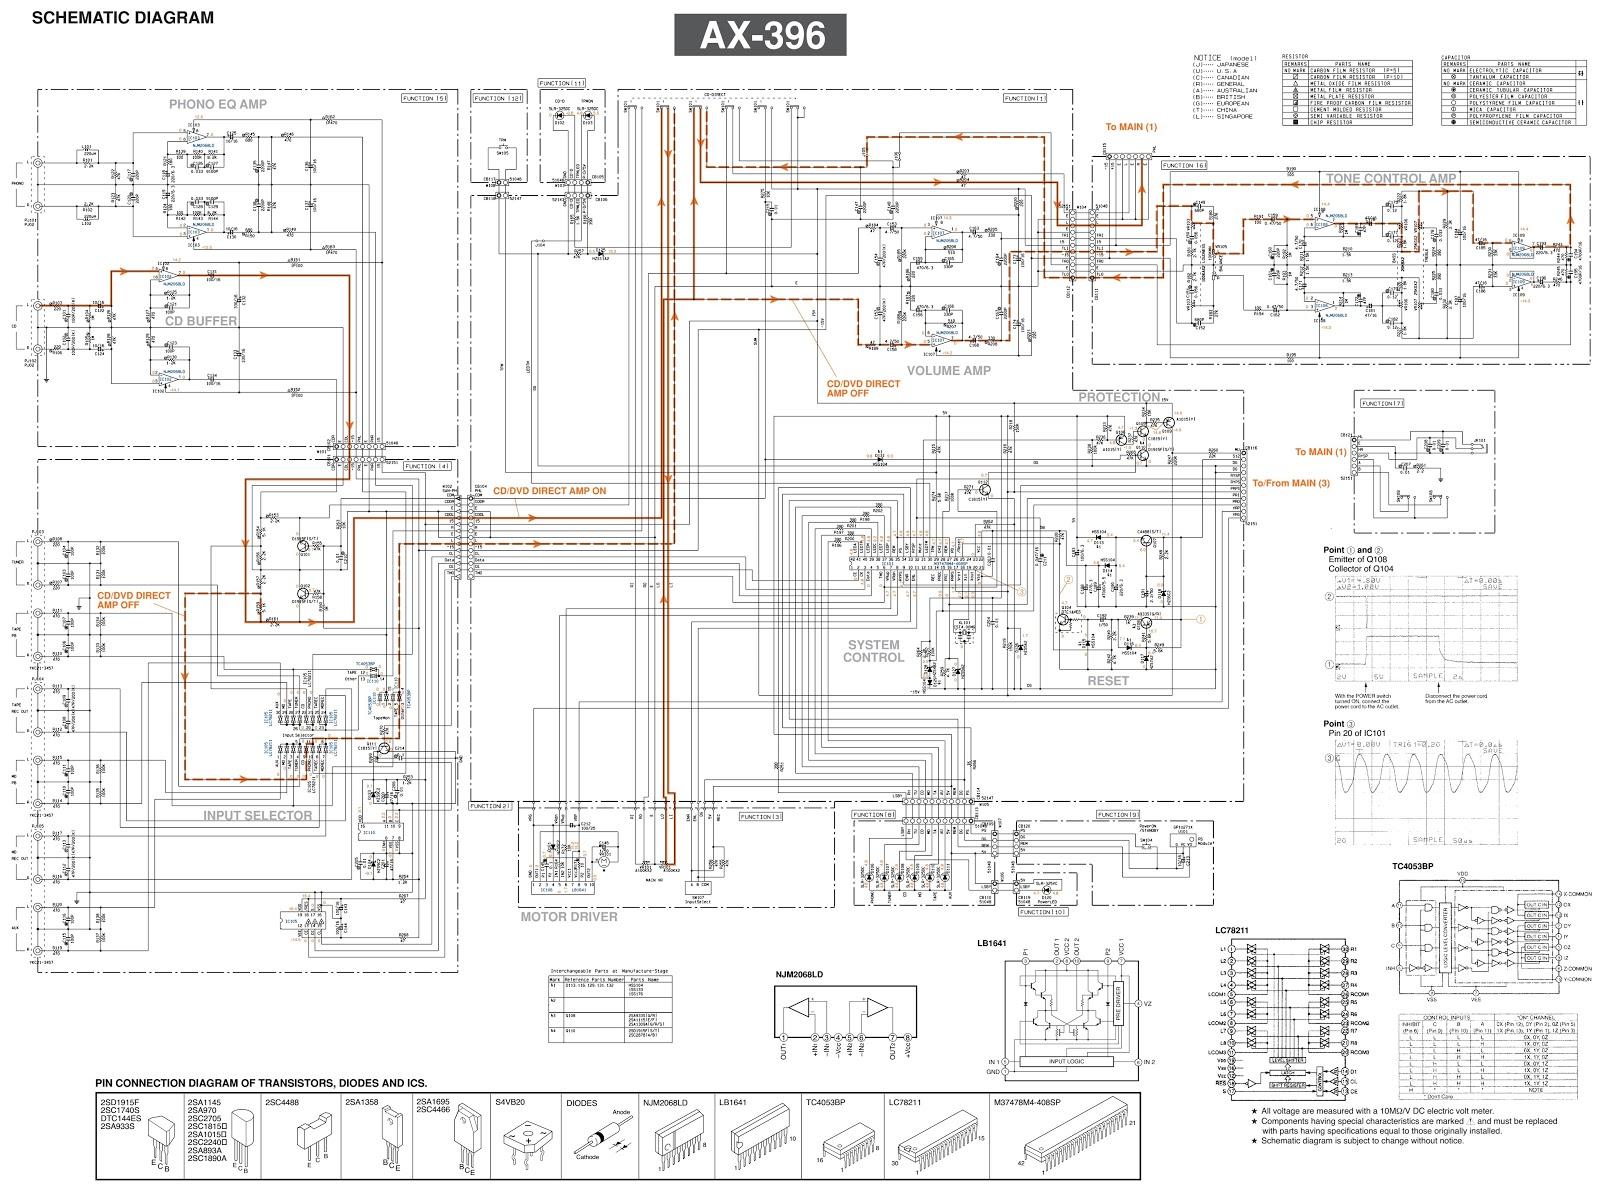 Yamaha AX396 Stereo Amplifier